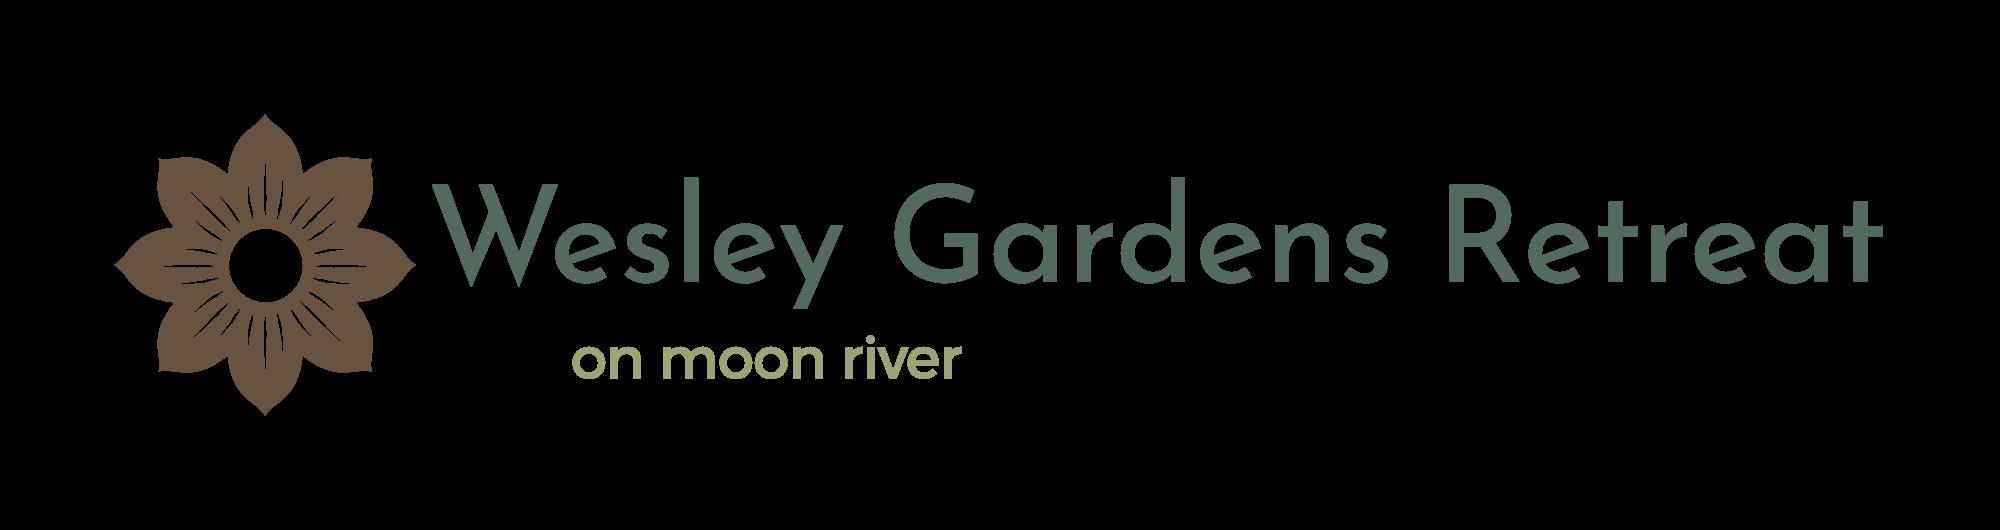 Wesley Gardens Retreat-logo (5).png